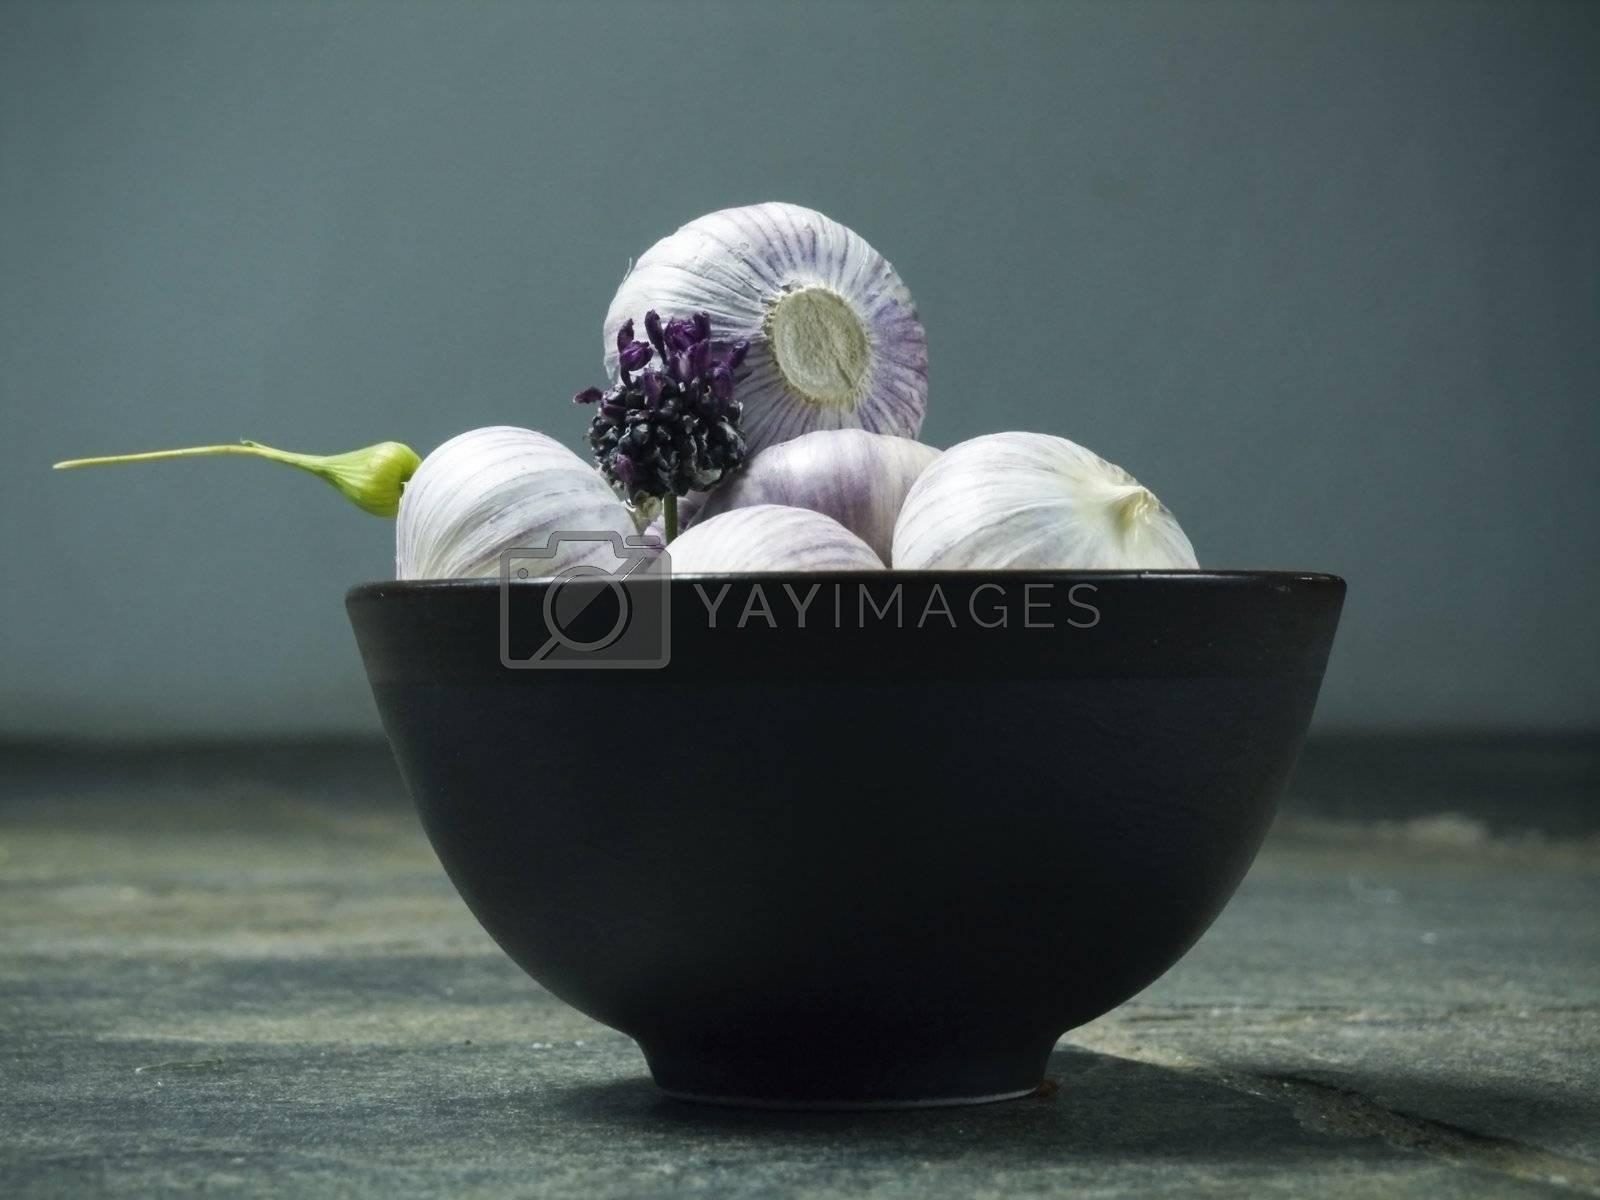 bowl full of fresh garlic on dark background